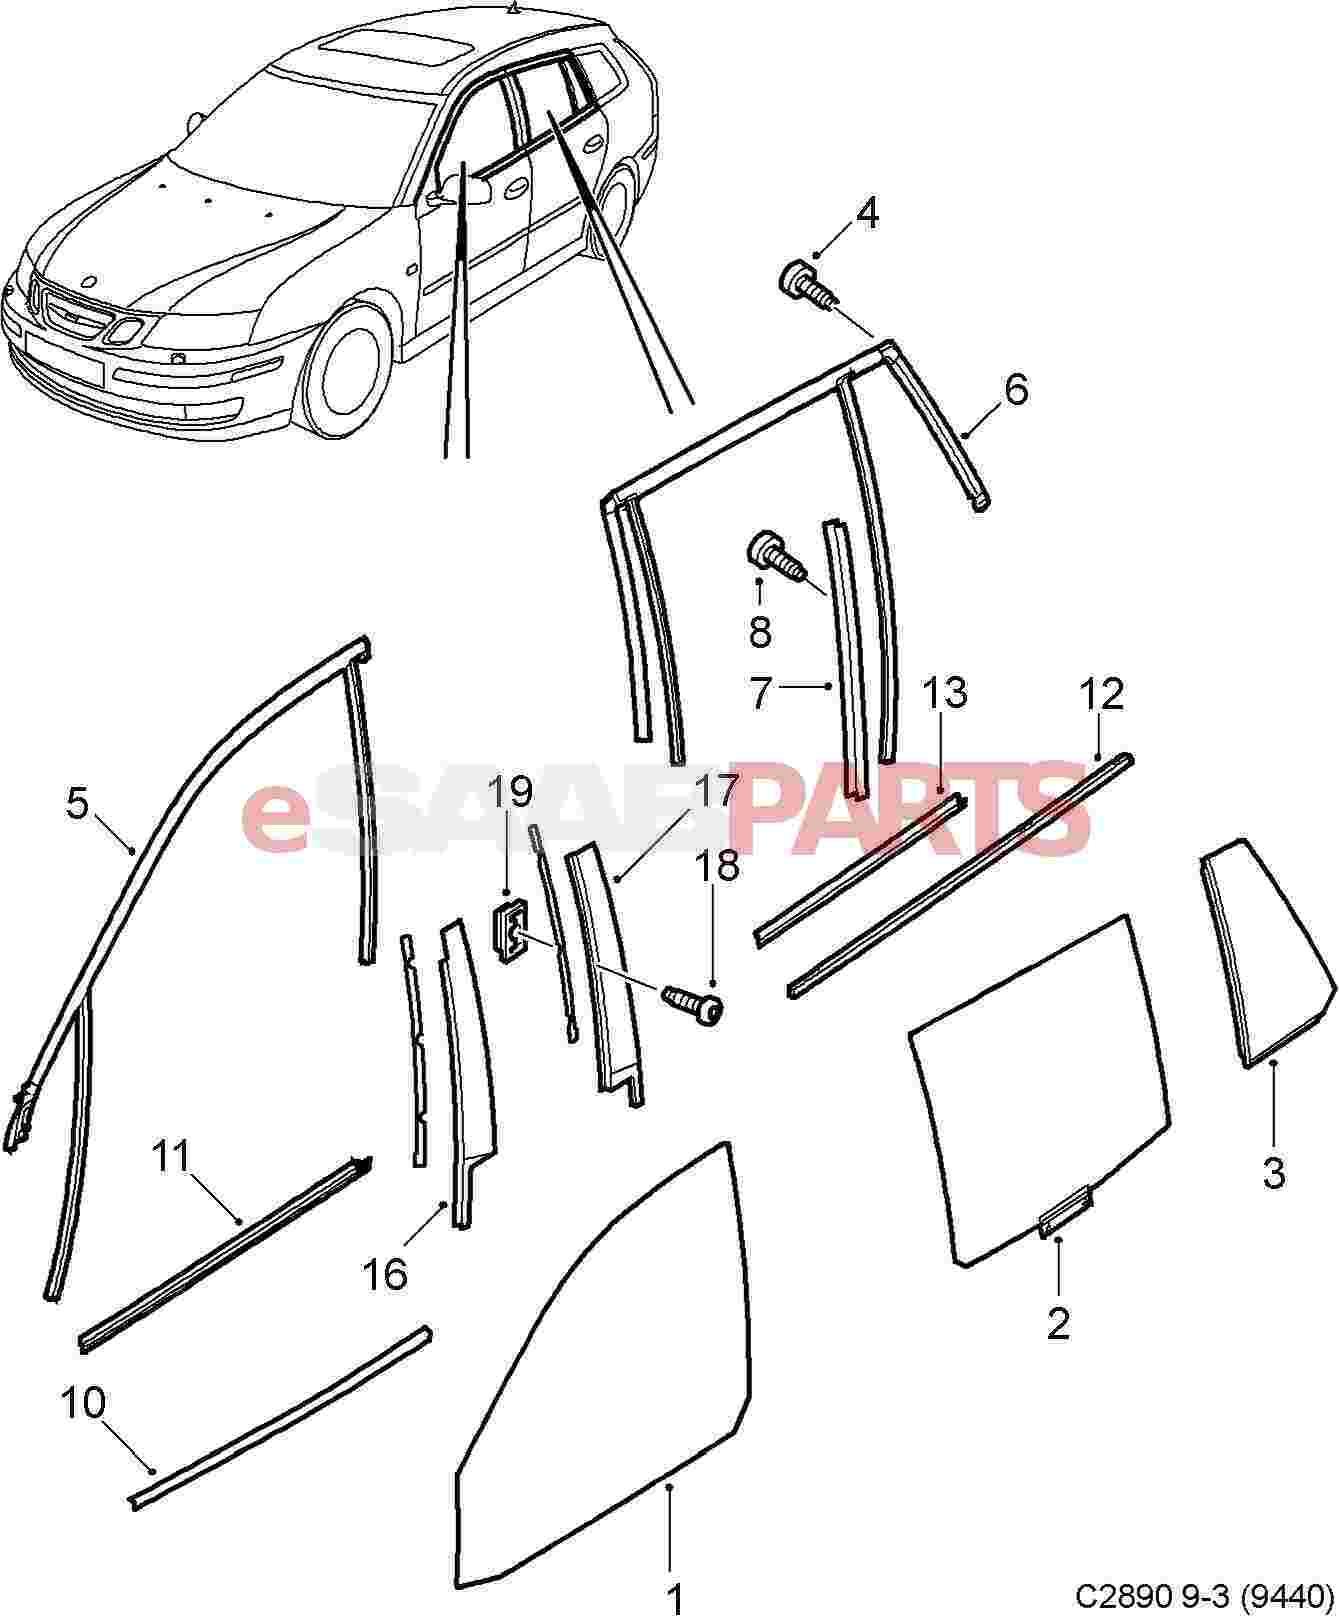 hight resolution of car window diagram wiring diagram operations car power window schematic diagram car window diagram